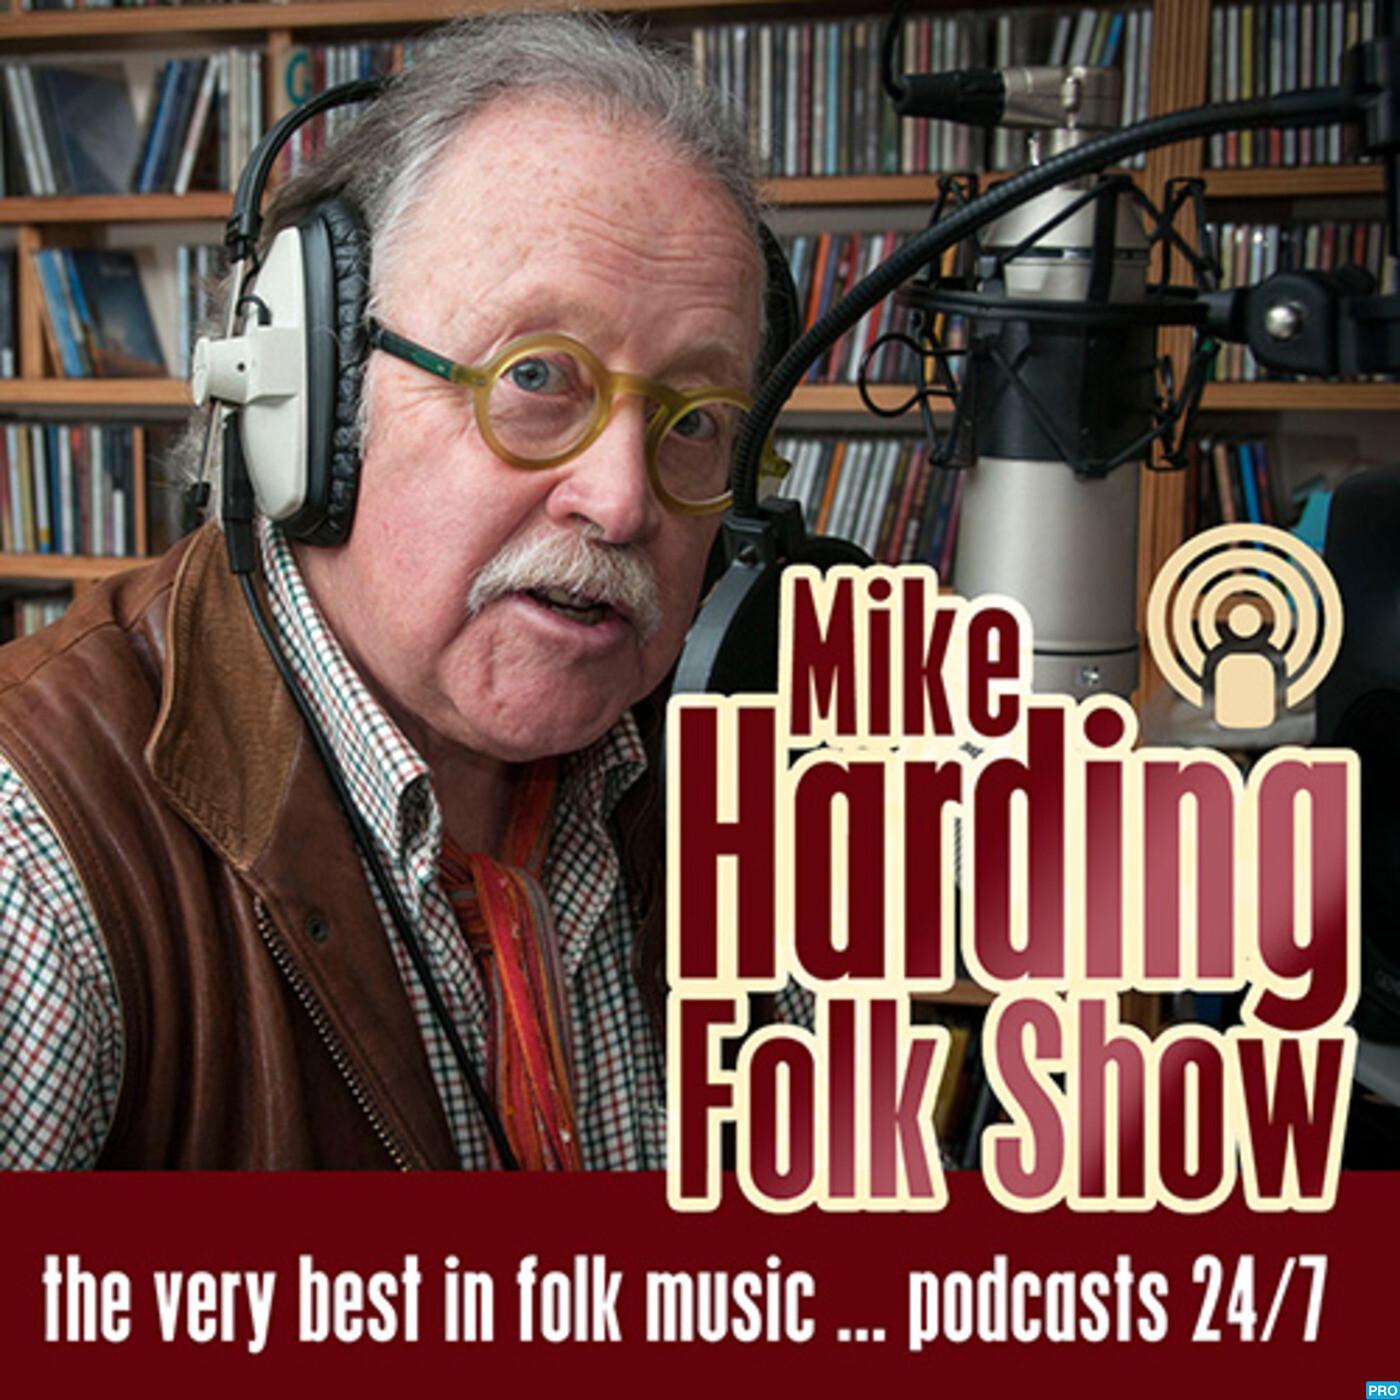 Mike Harding Folk Show 195